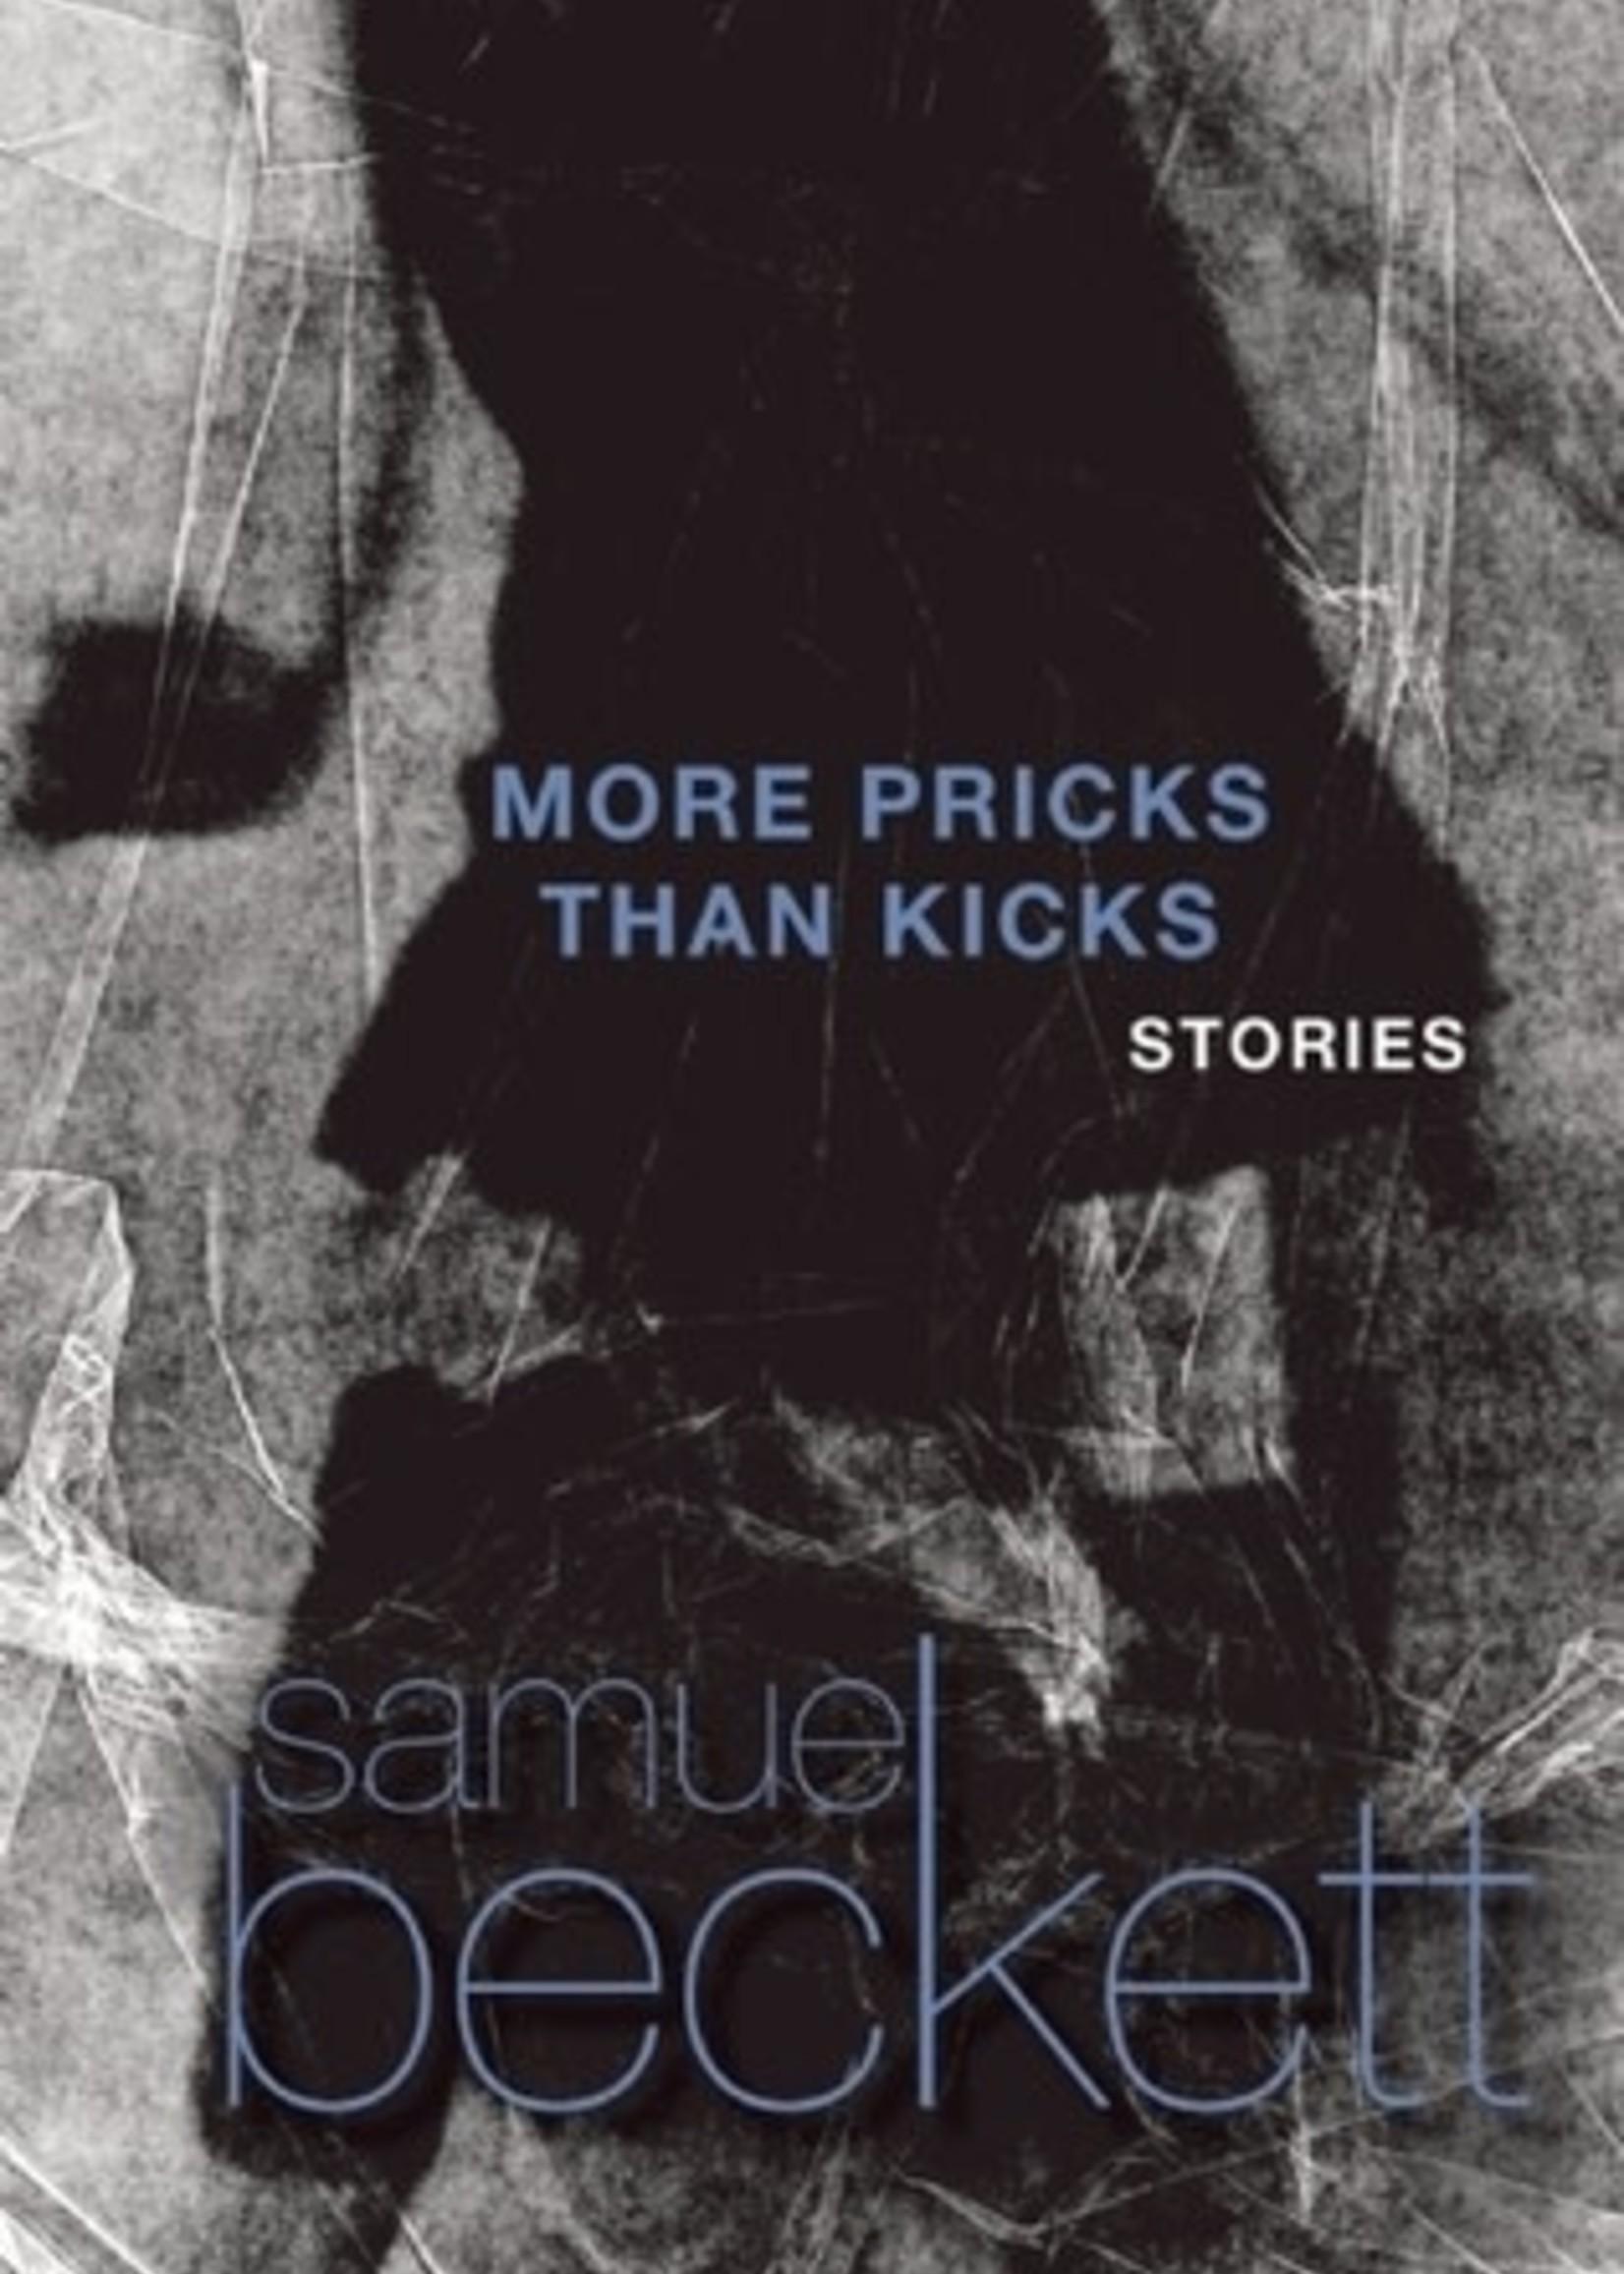 More Pricks than Kicks by Samuel Beckett